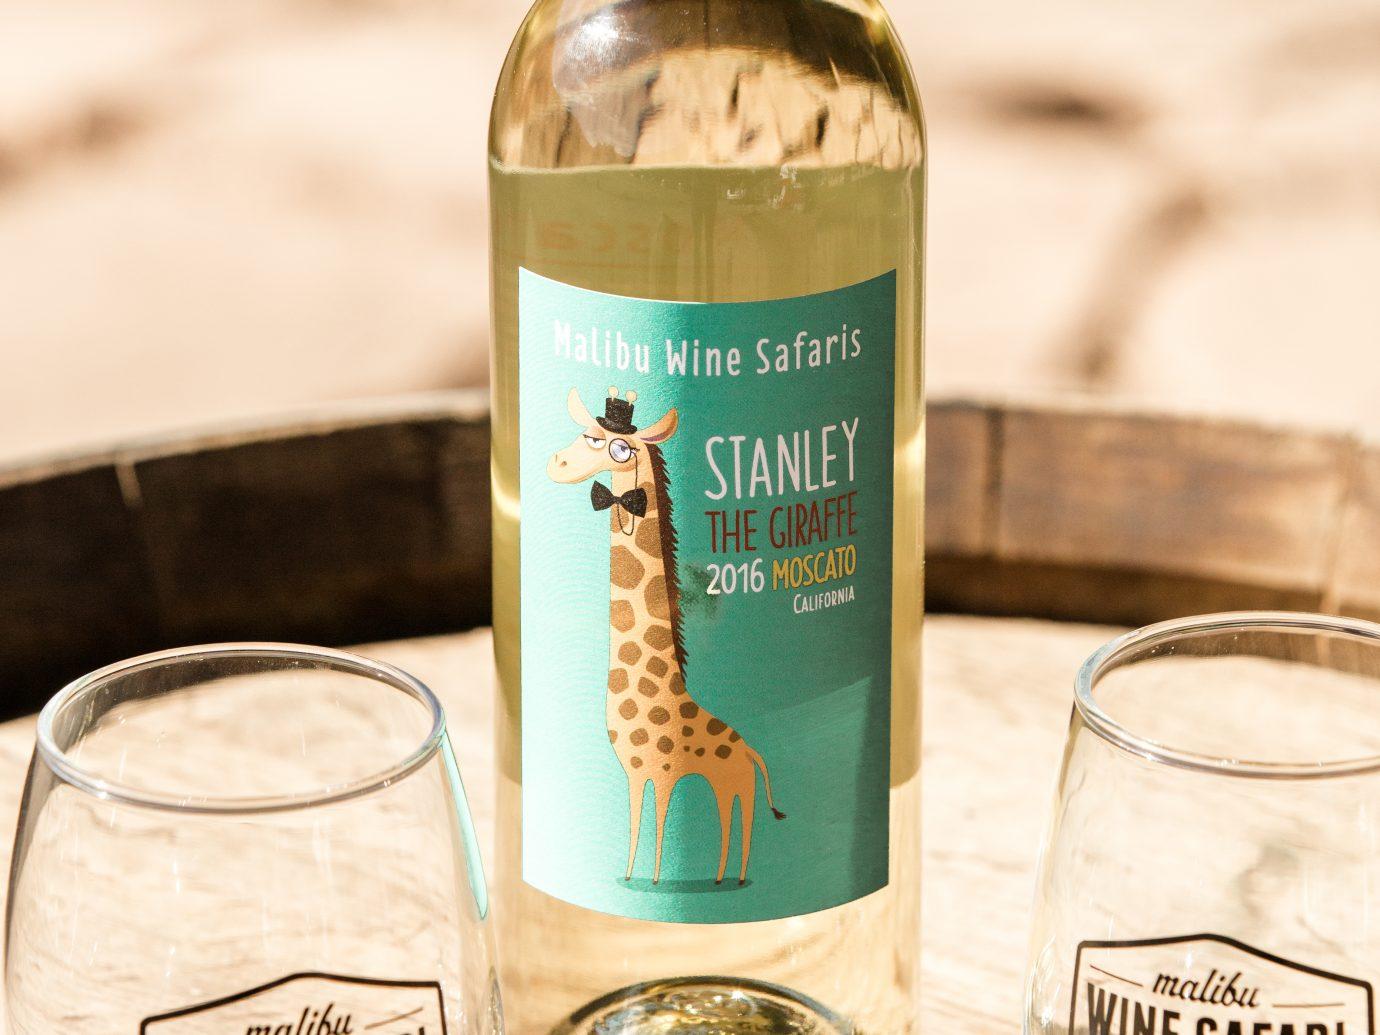 Giraffe labeled wine